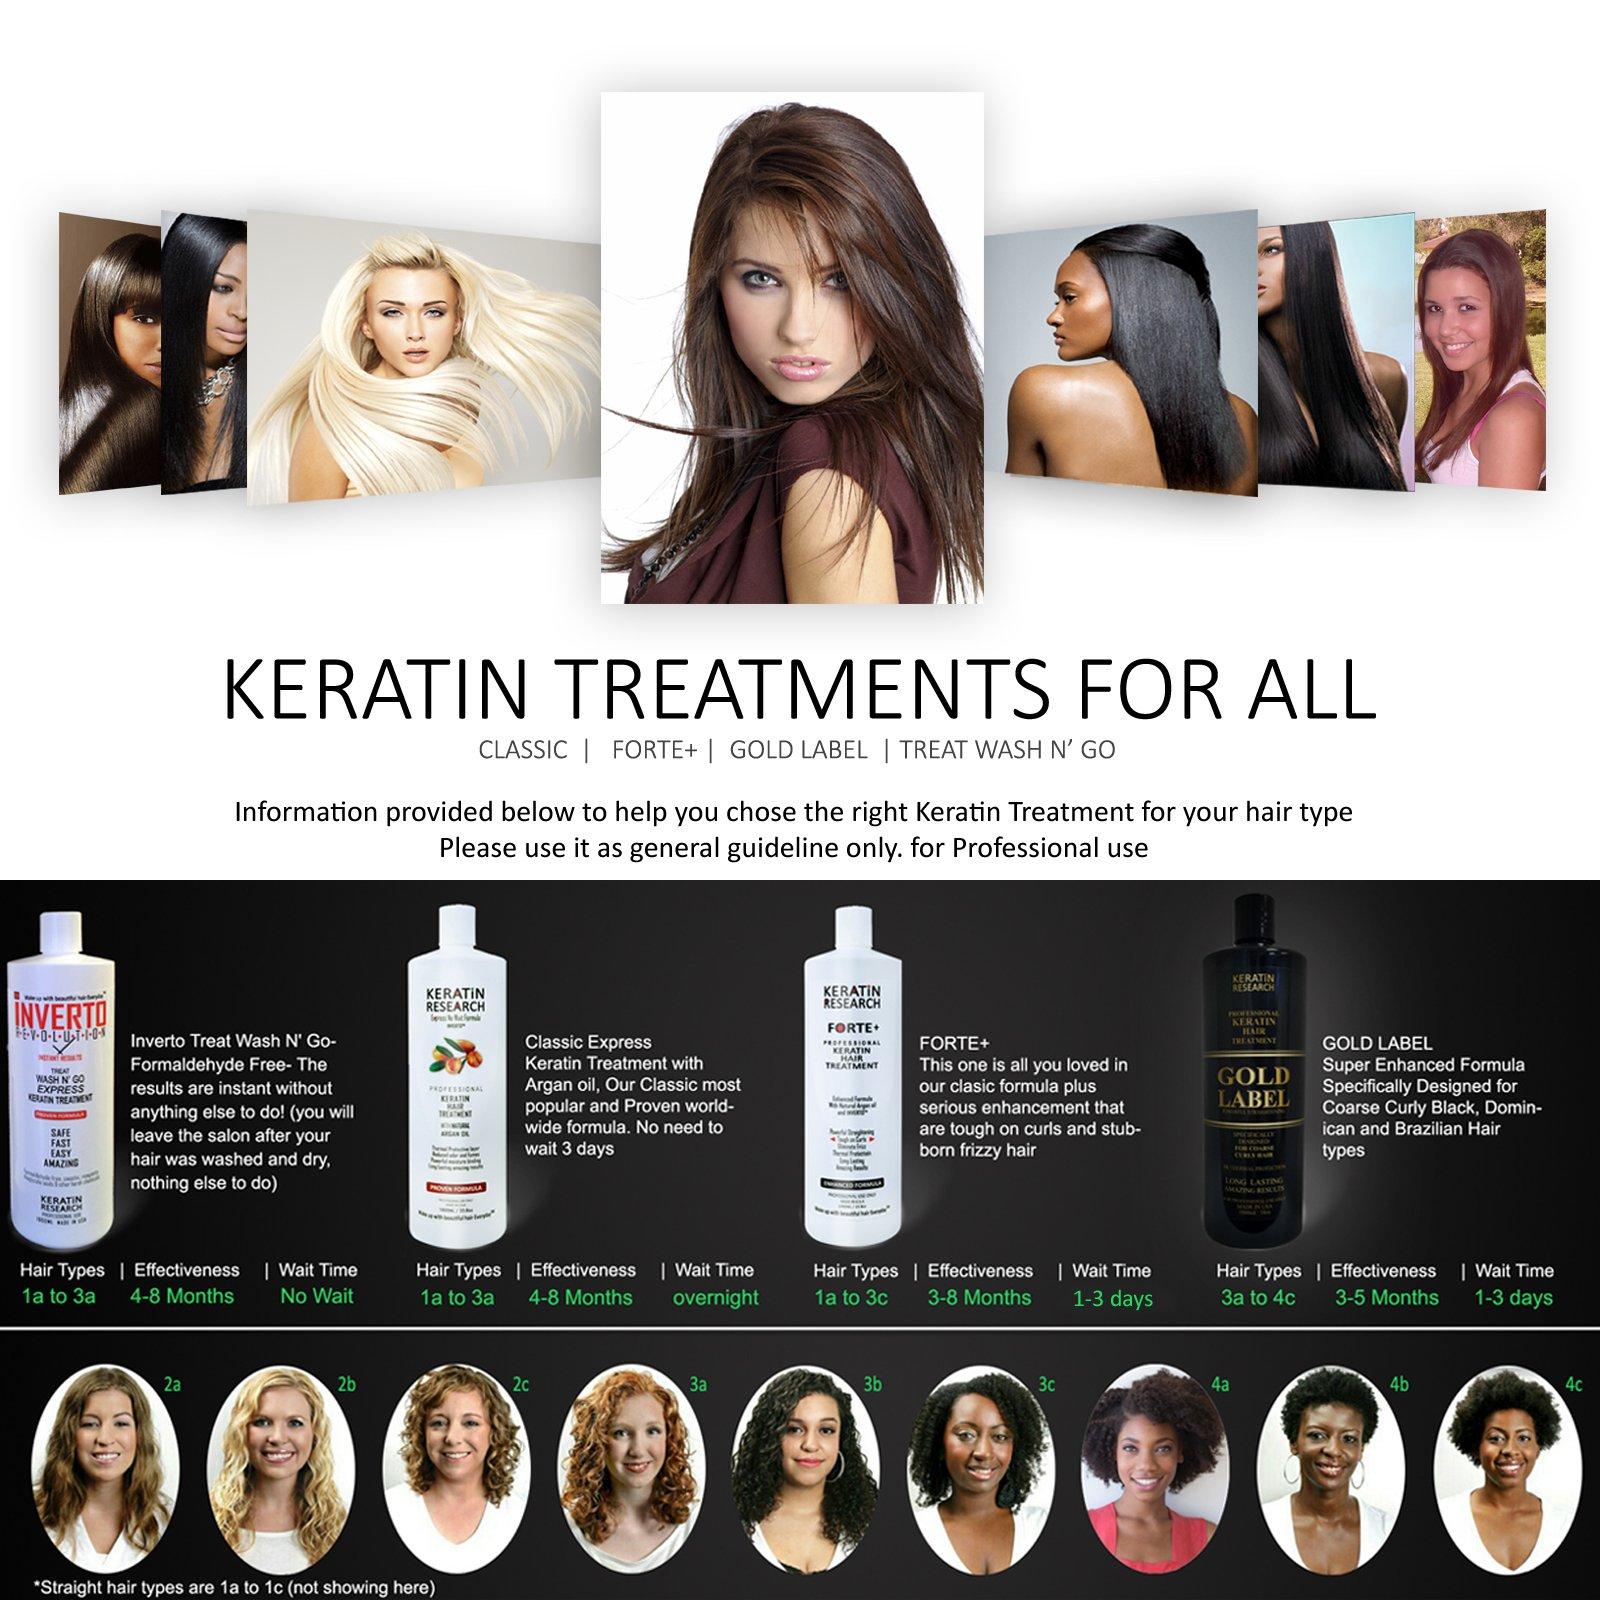 Keratin Forte Plus, Extra Strength Hair Treatment 4 Bottles 1000ml Kit by Keratin Research (Image #2)